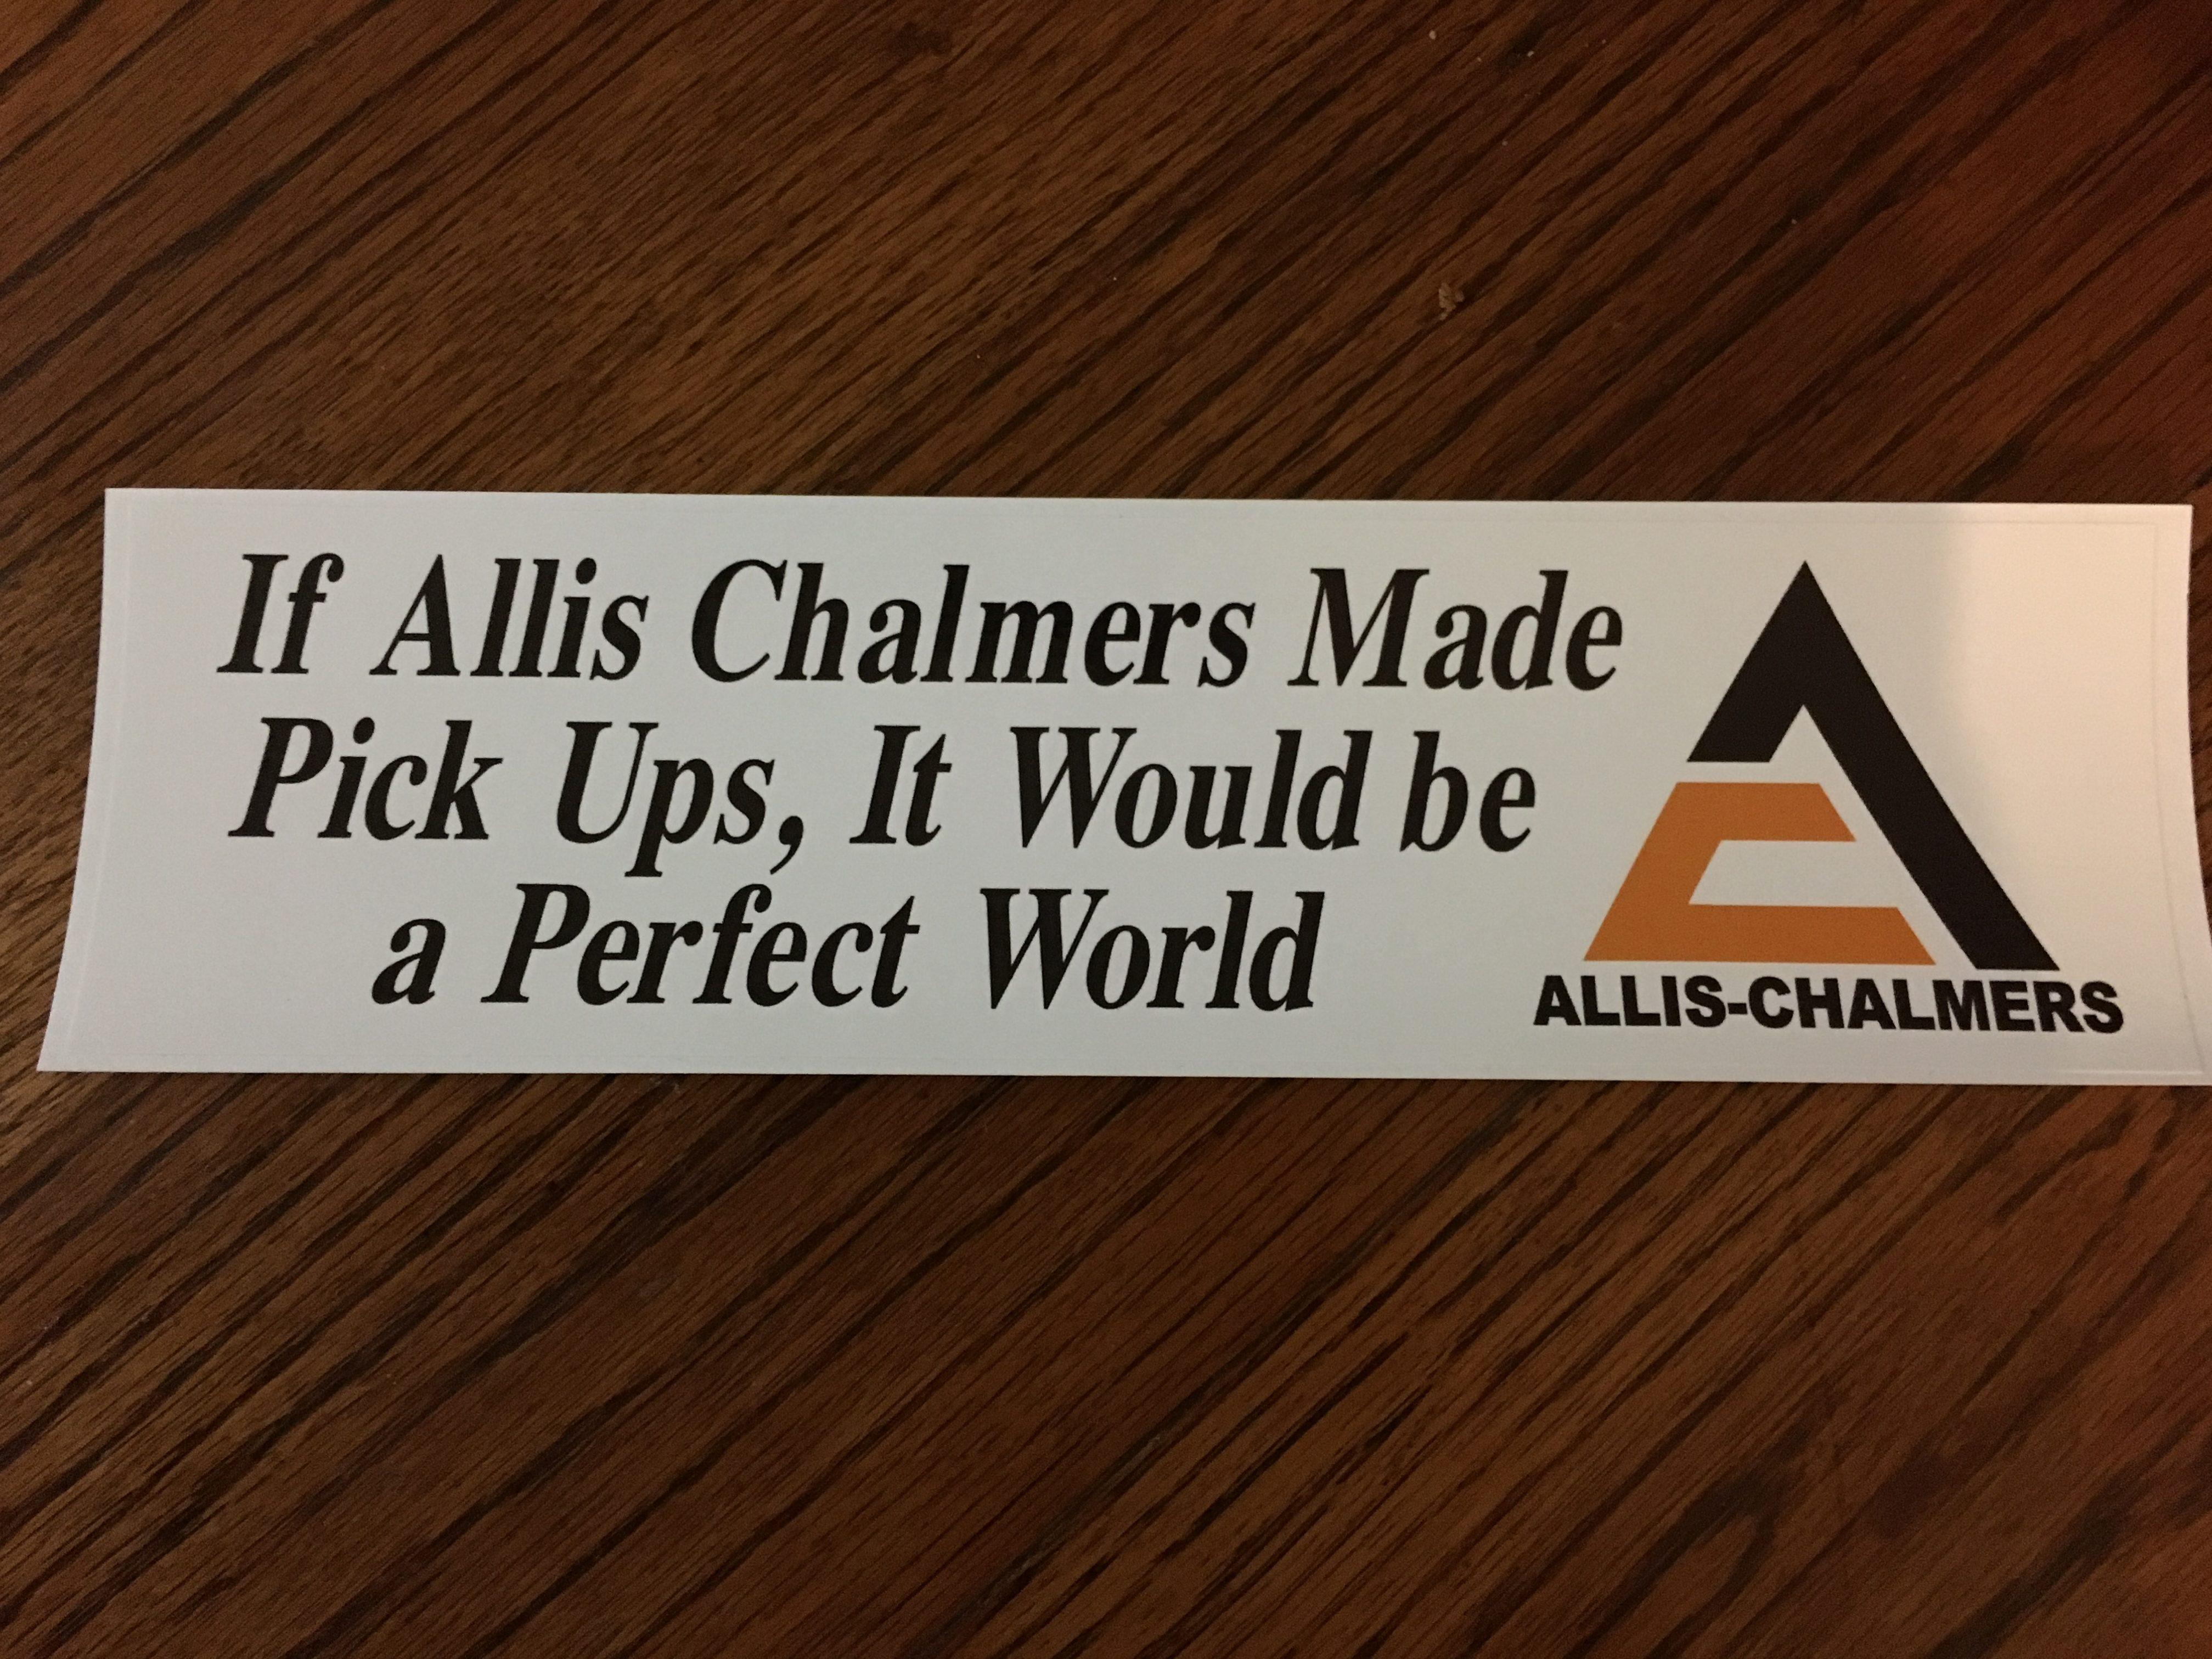 Allis Chalmers Bumper sticker  If Allis Chalmers made Pickups